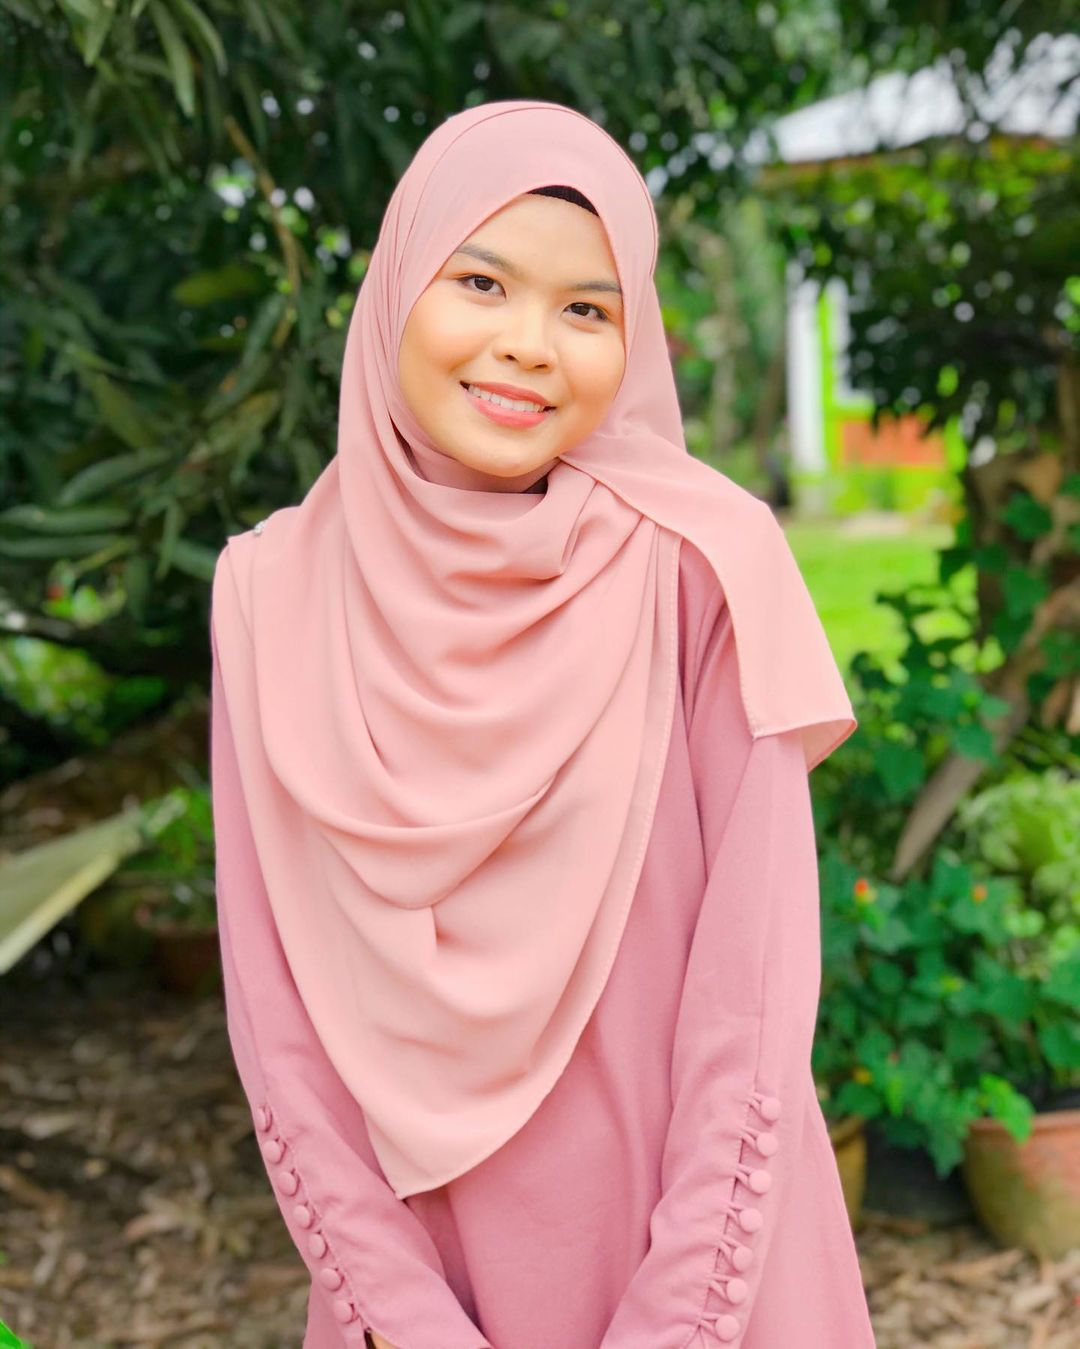 Selepas Kontroversi Video Muzik Keterlaluan, Wani Syaz Tampil Dengan Lagu Baru Berkonsepkan Tarian Padang Pasir 3